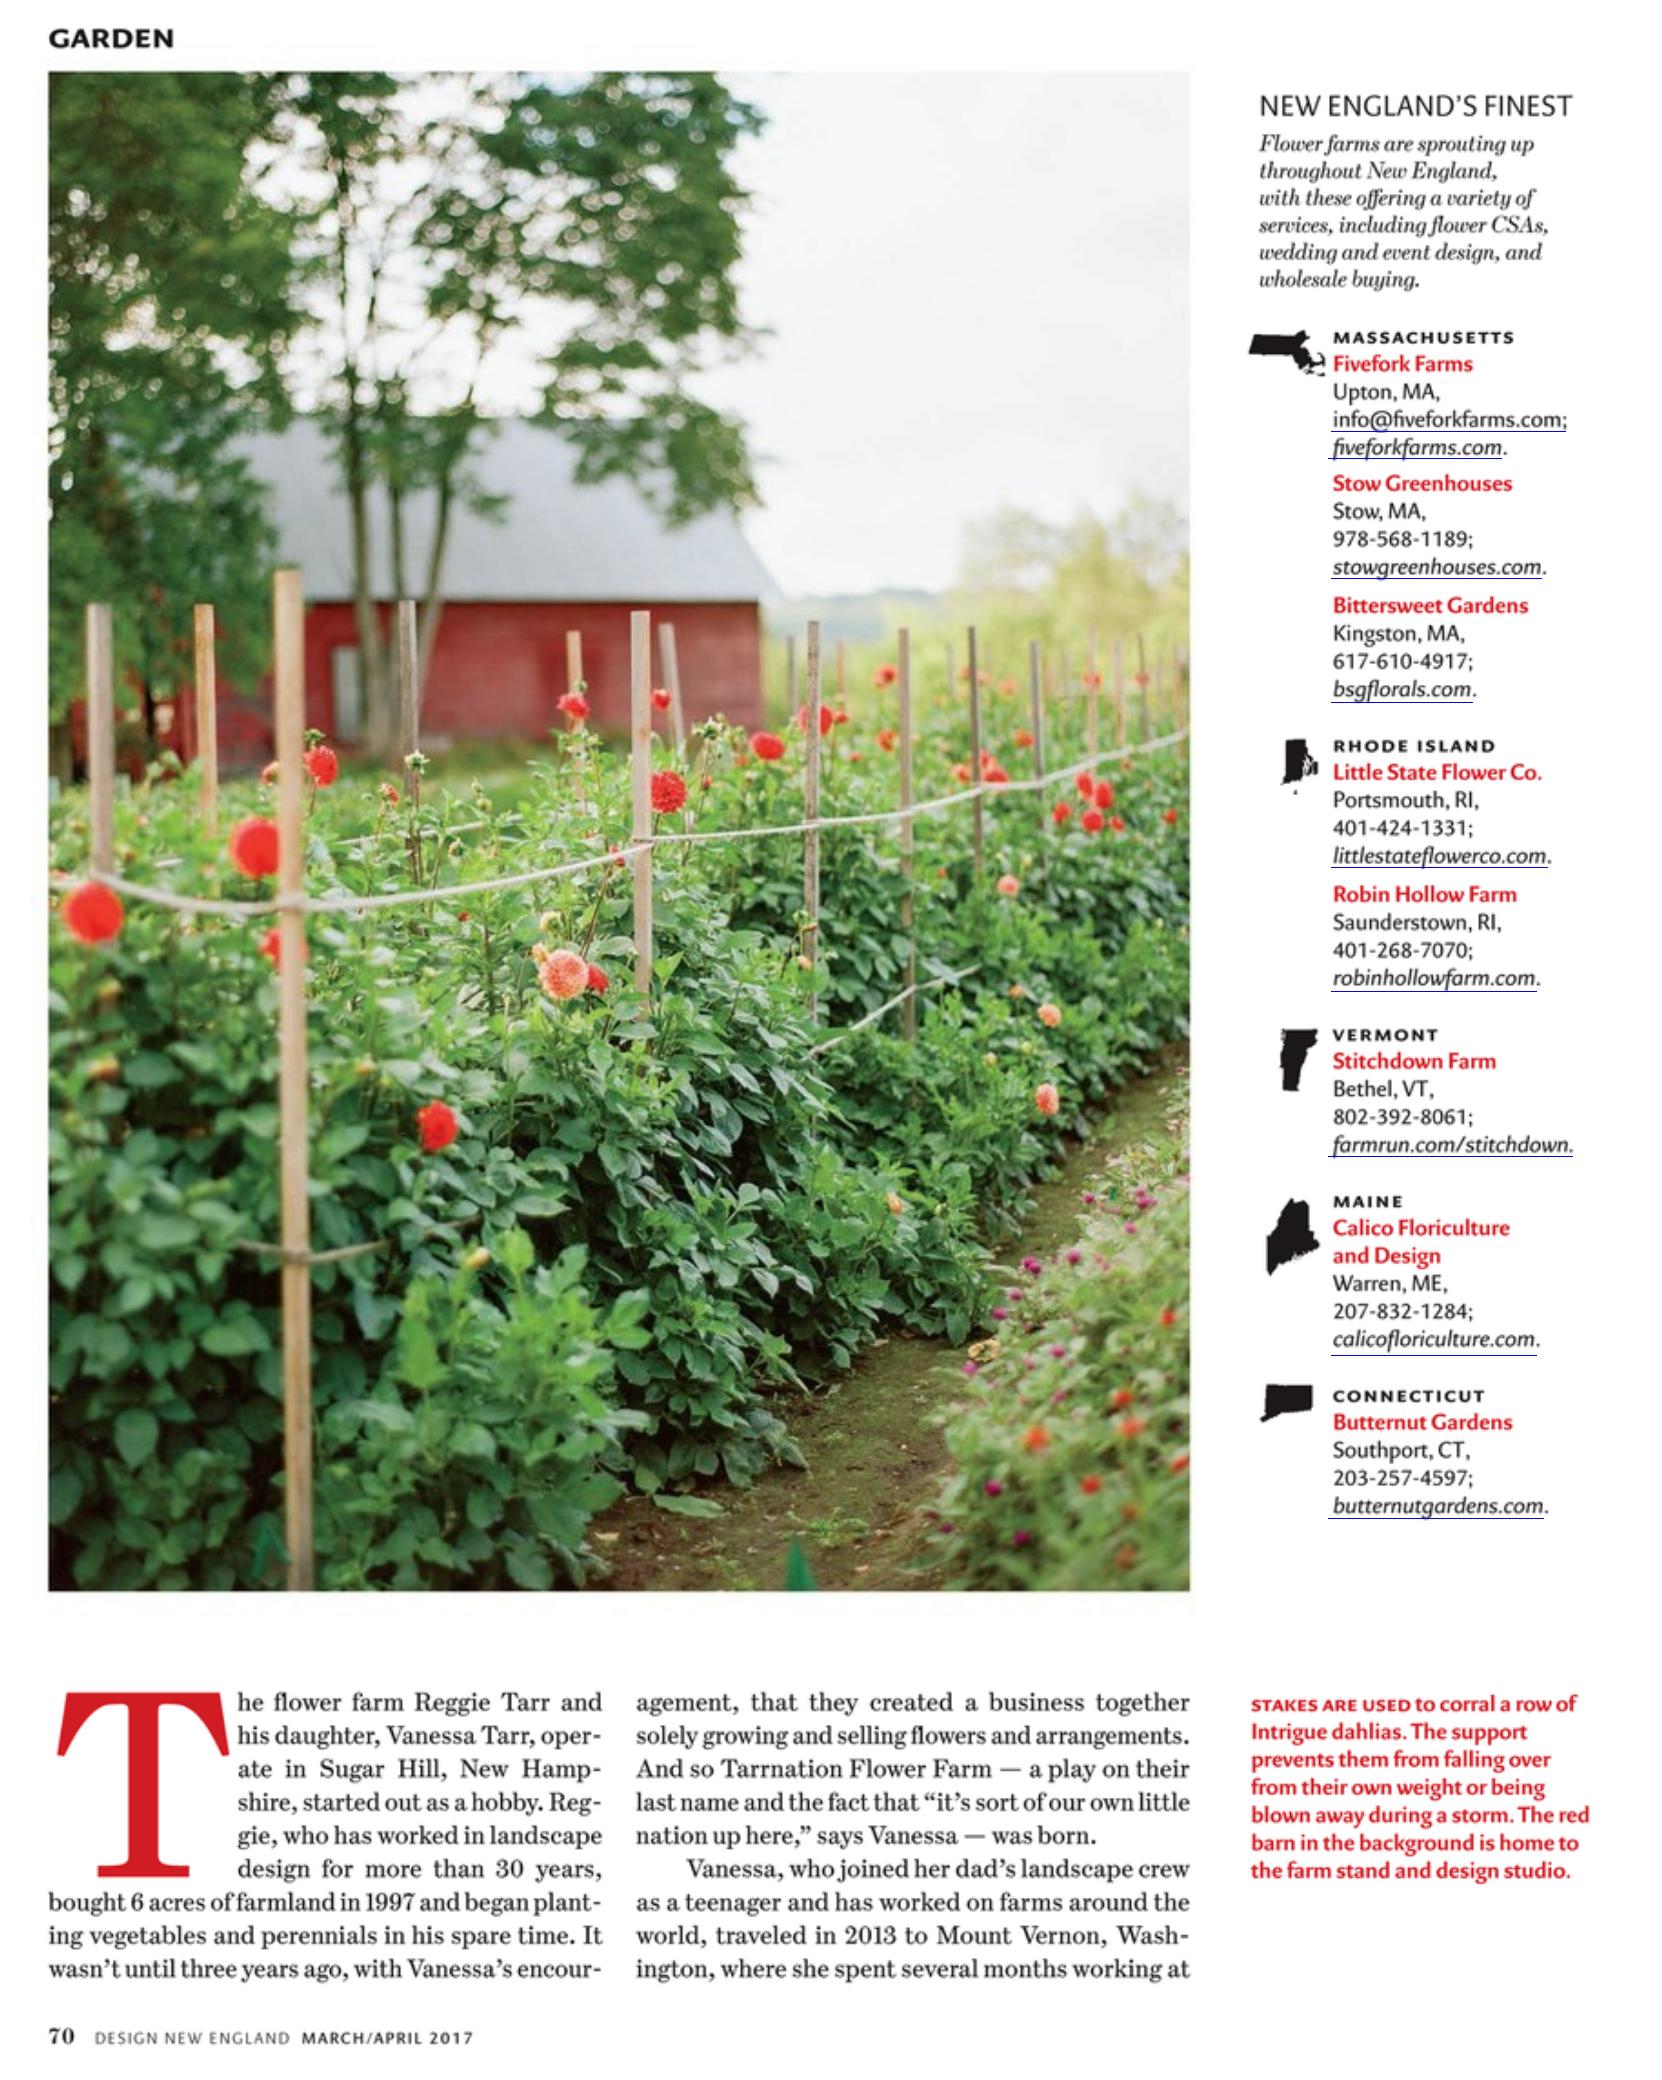 Stitchdown Farm in New England Design Magazine